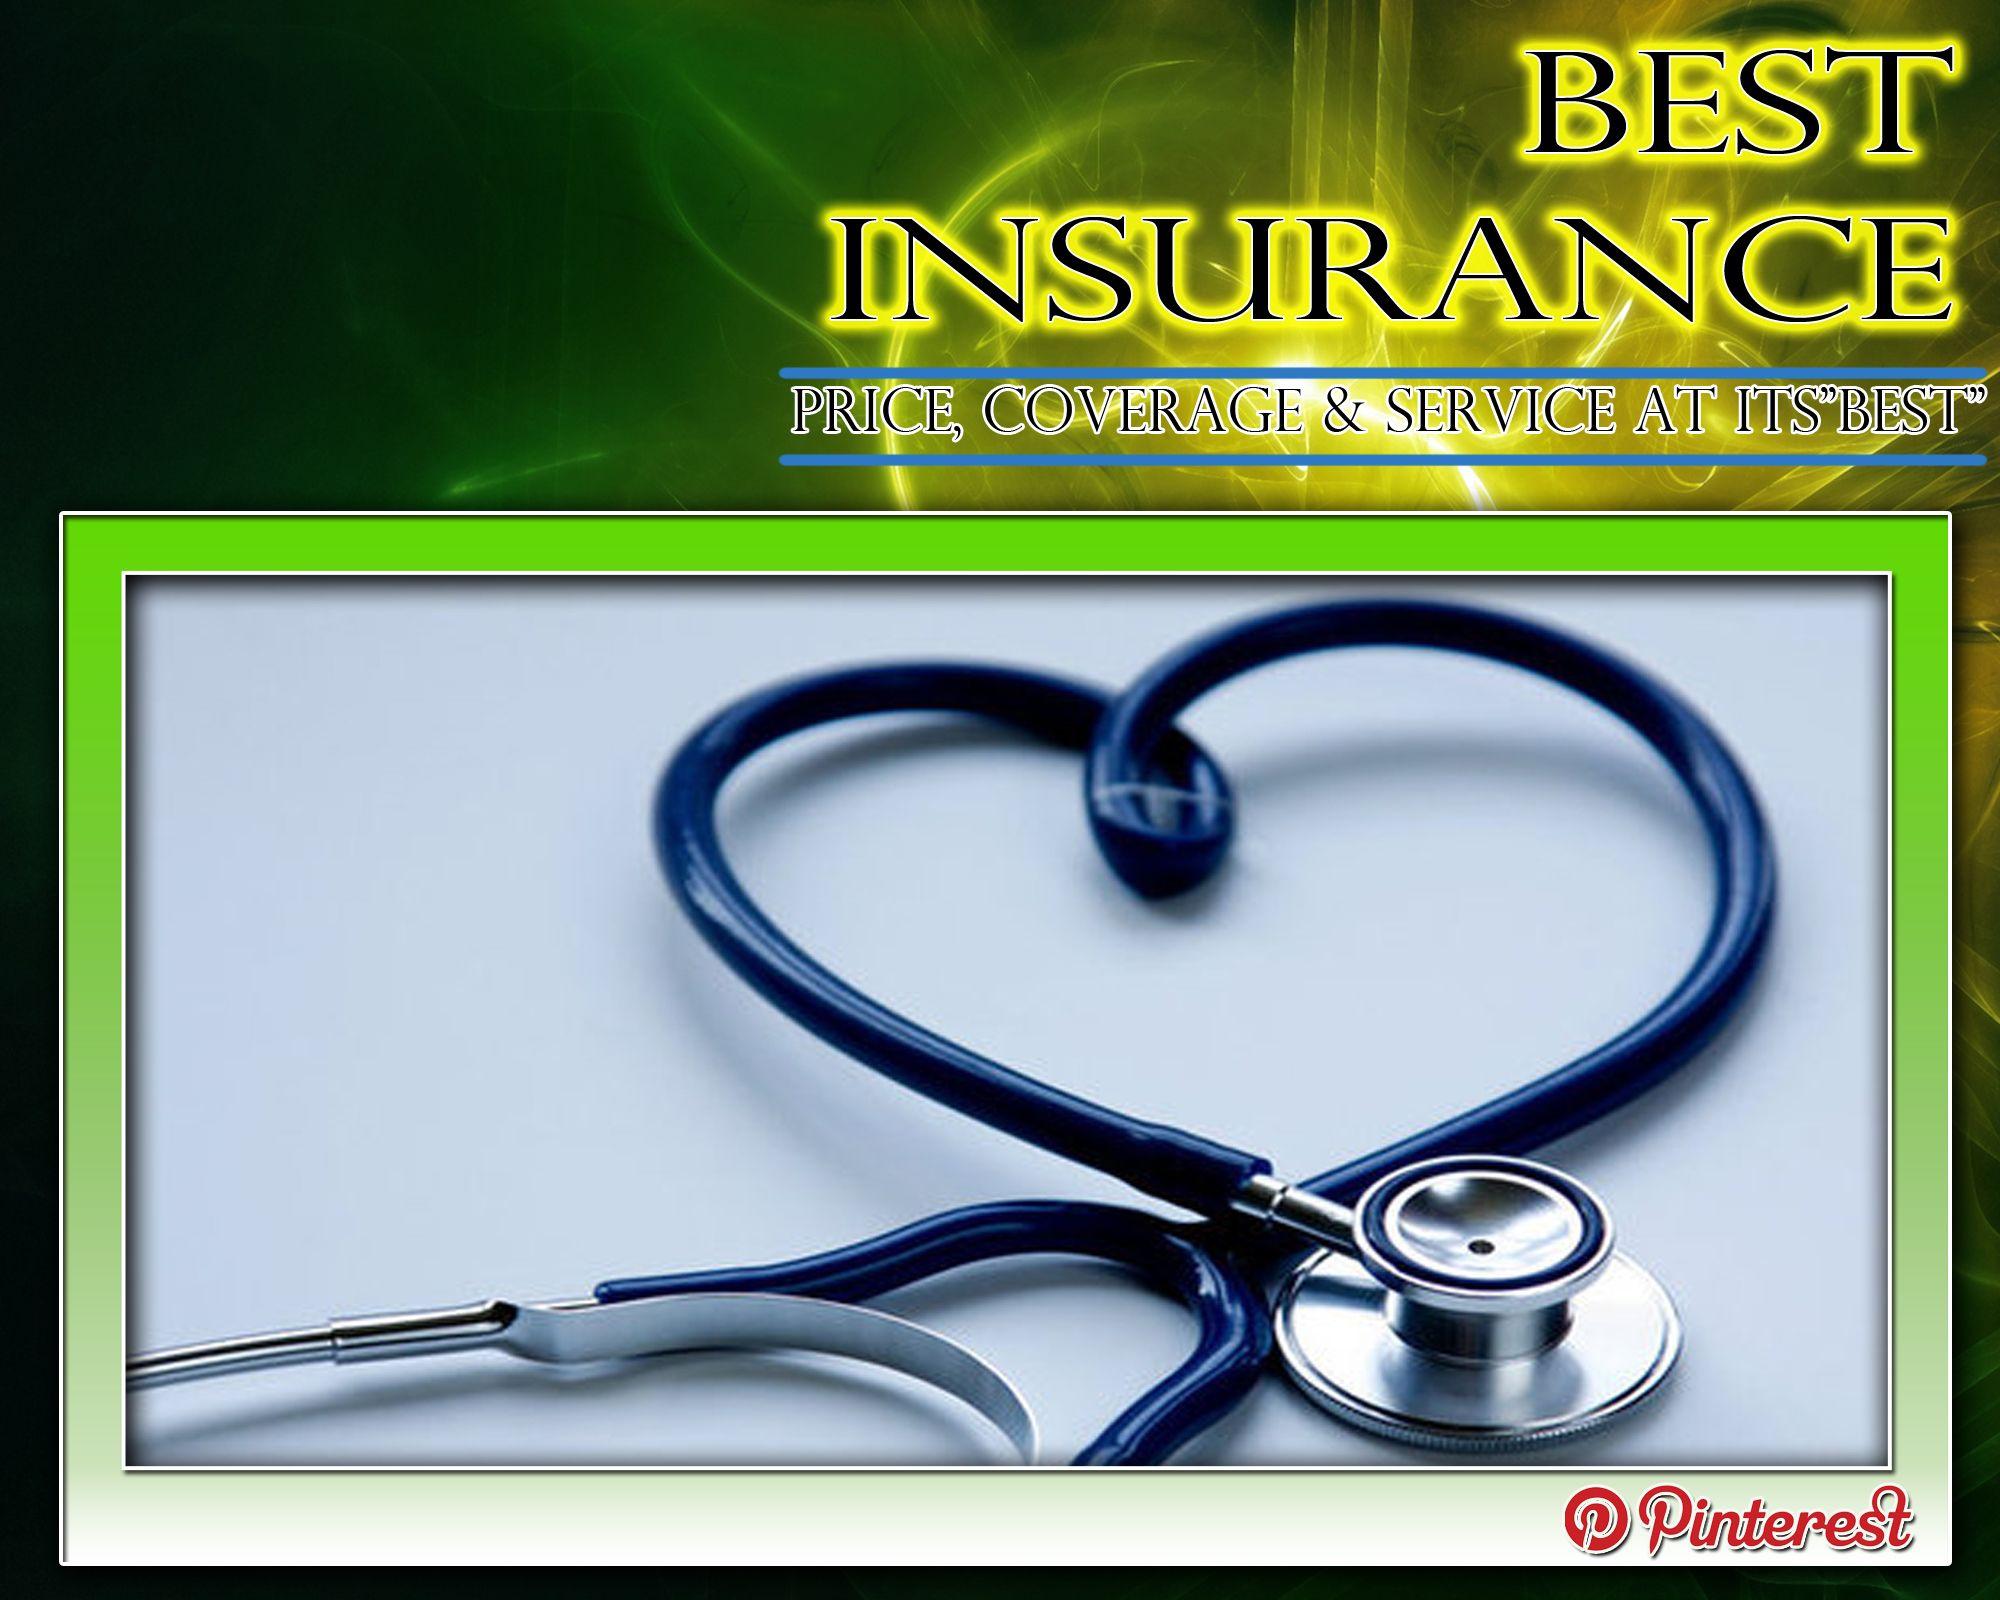 Automobileinsuranceftlauderdale national health